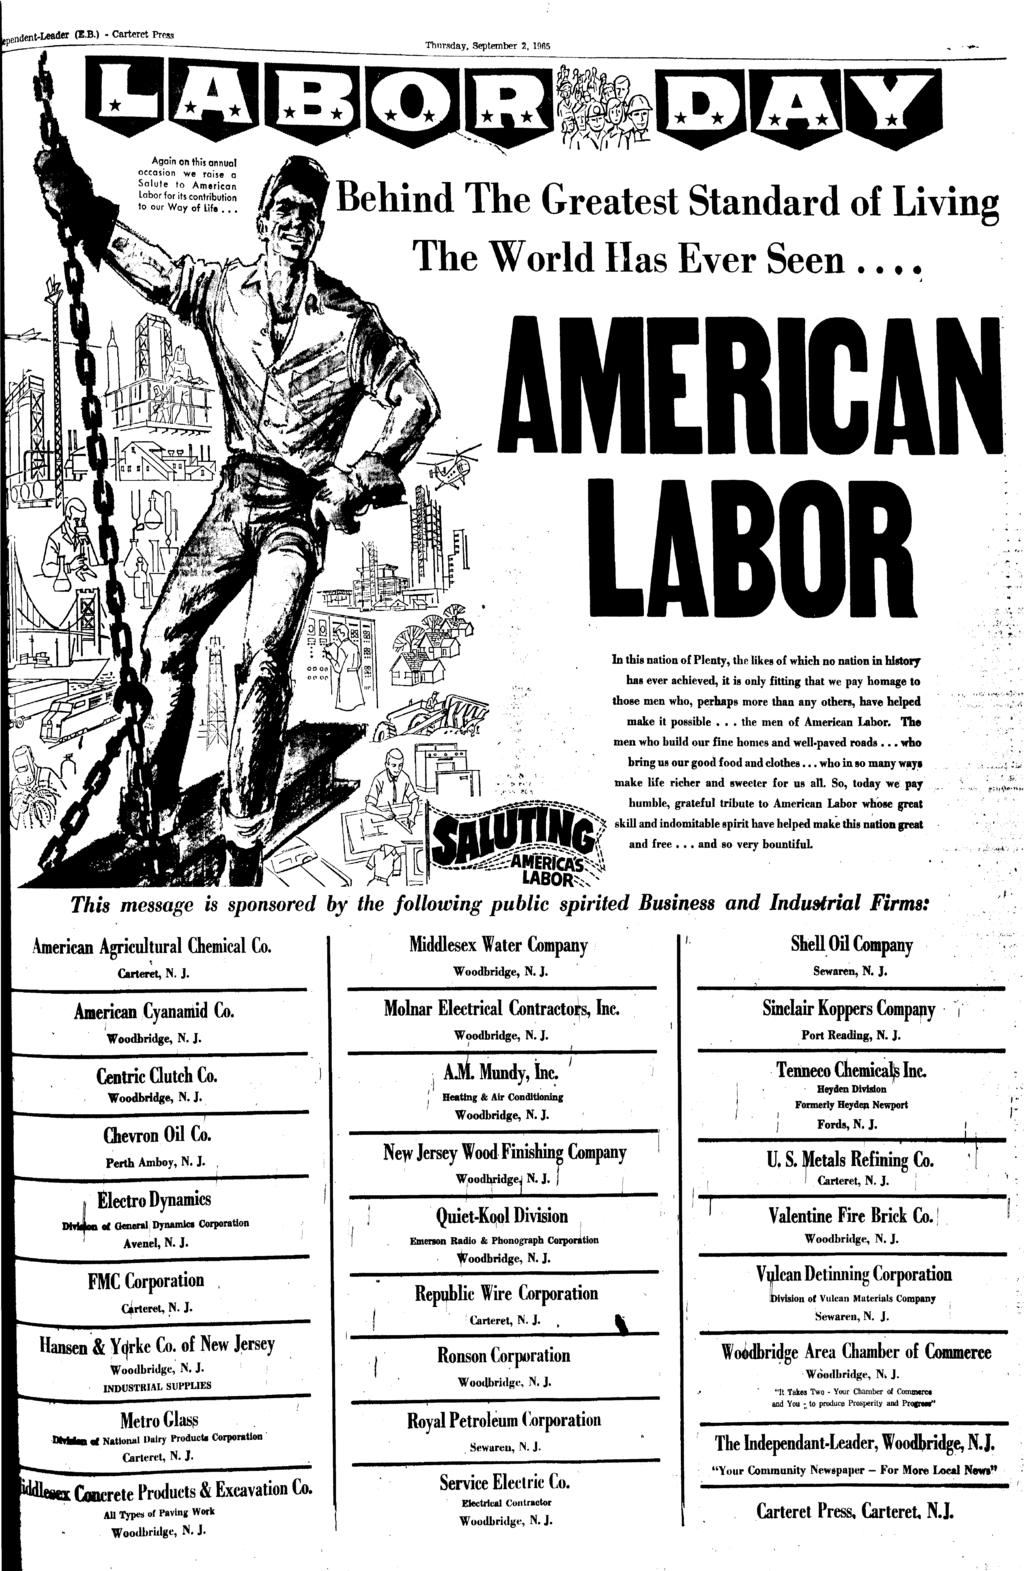 Carteret Press - Carteret, New Jersey U.S.A. - September 2, 1965